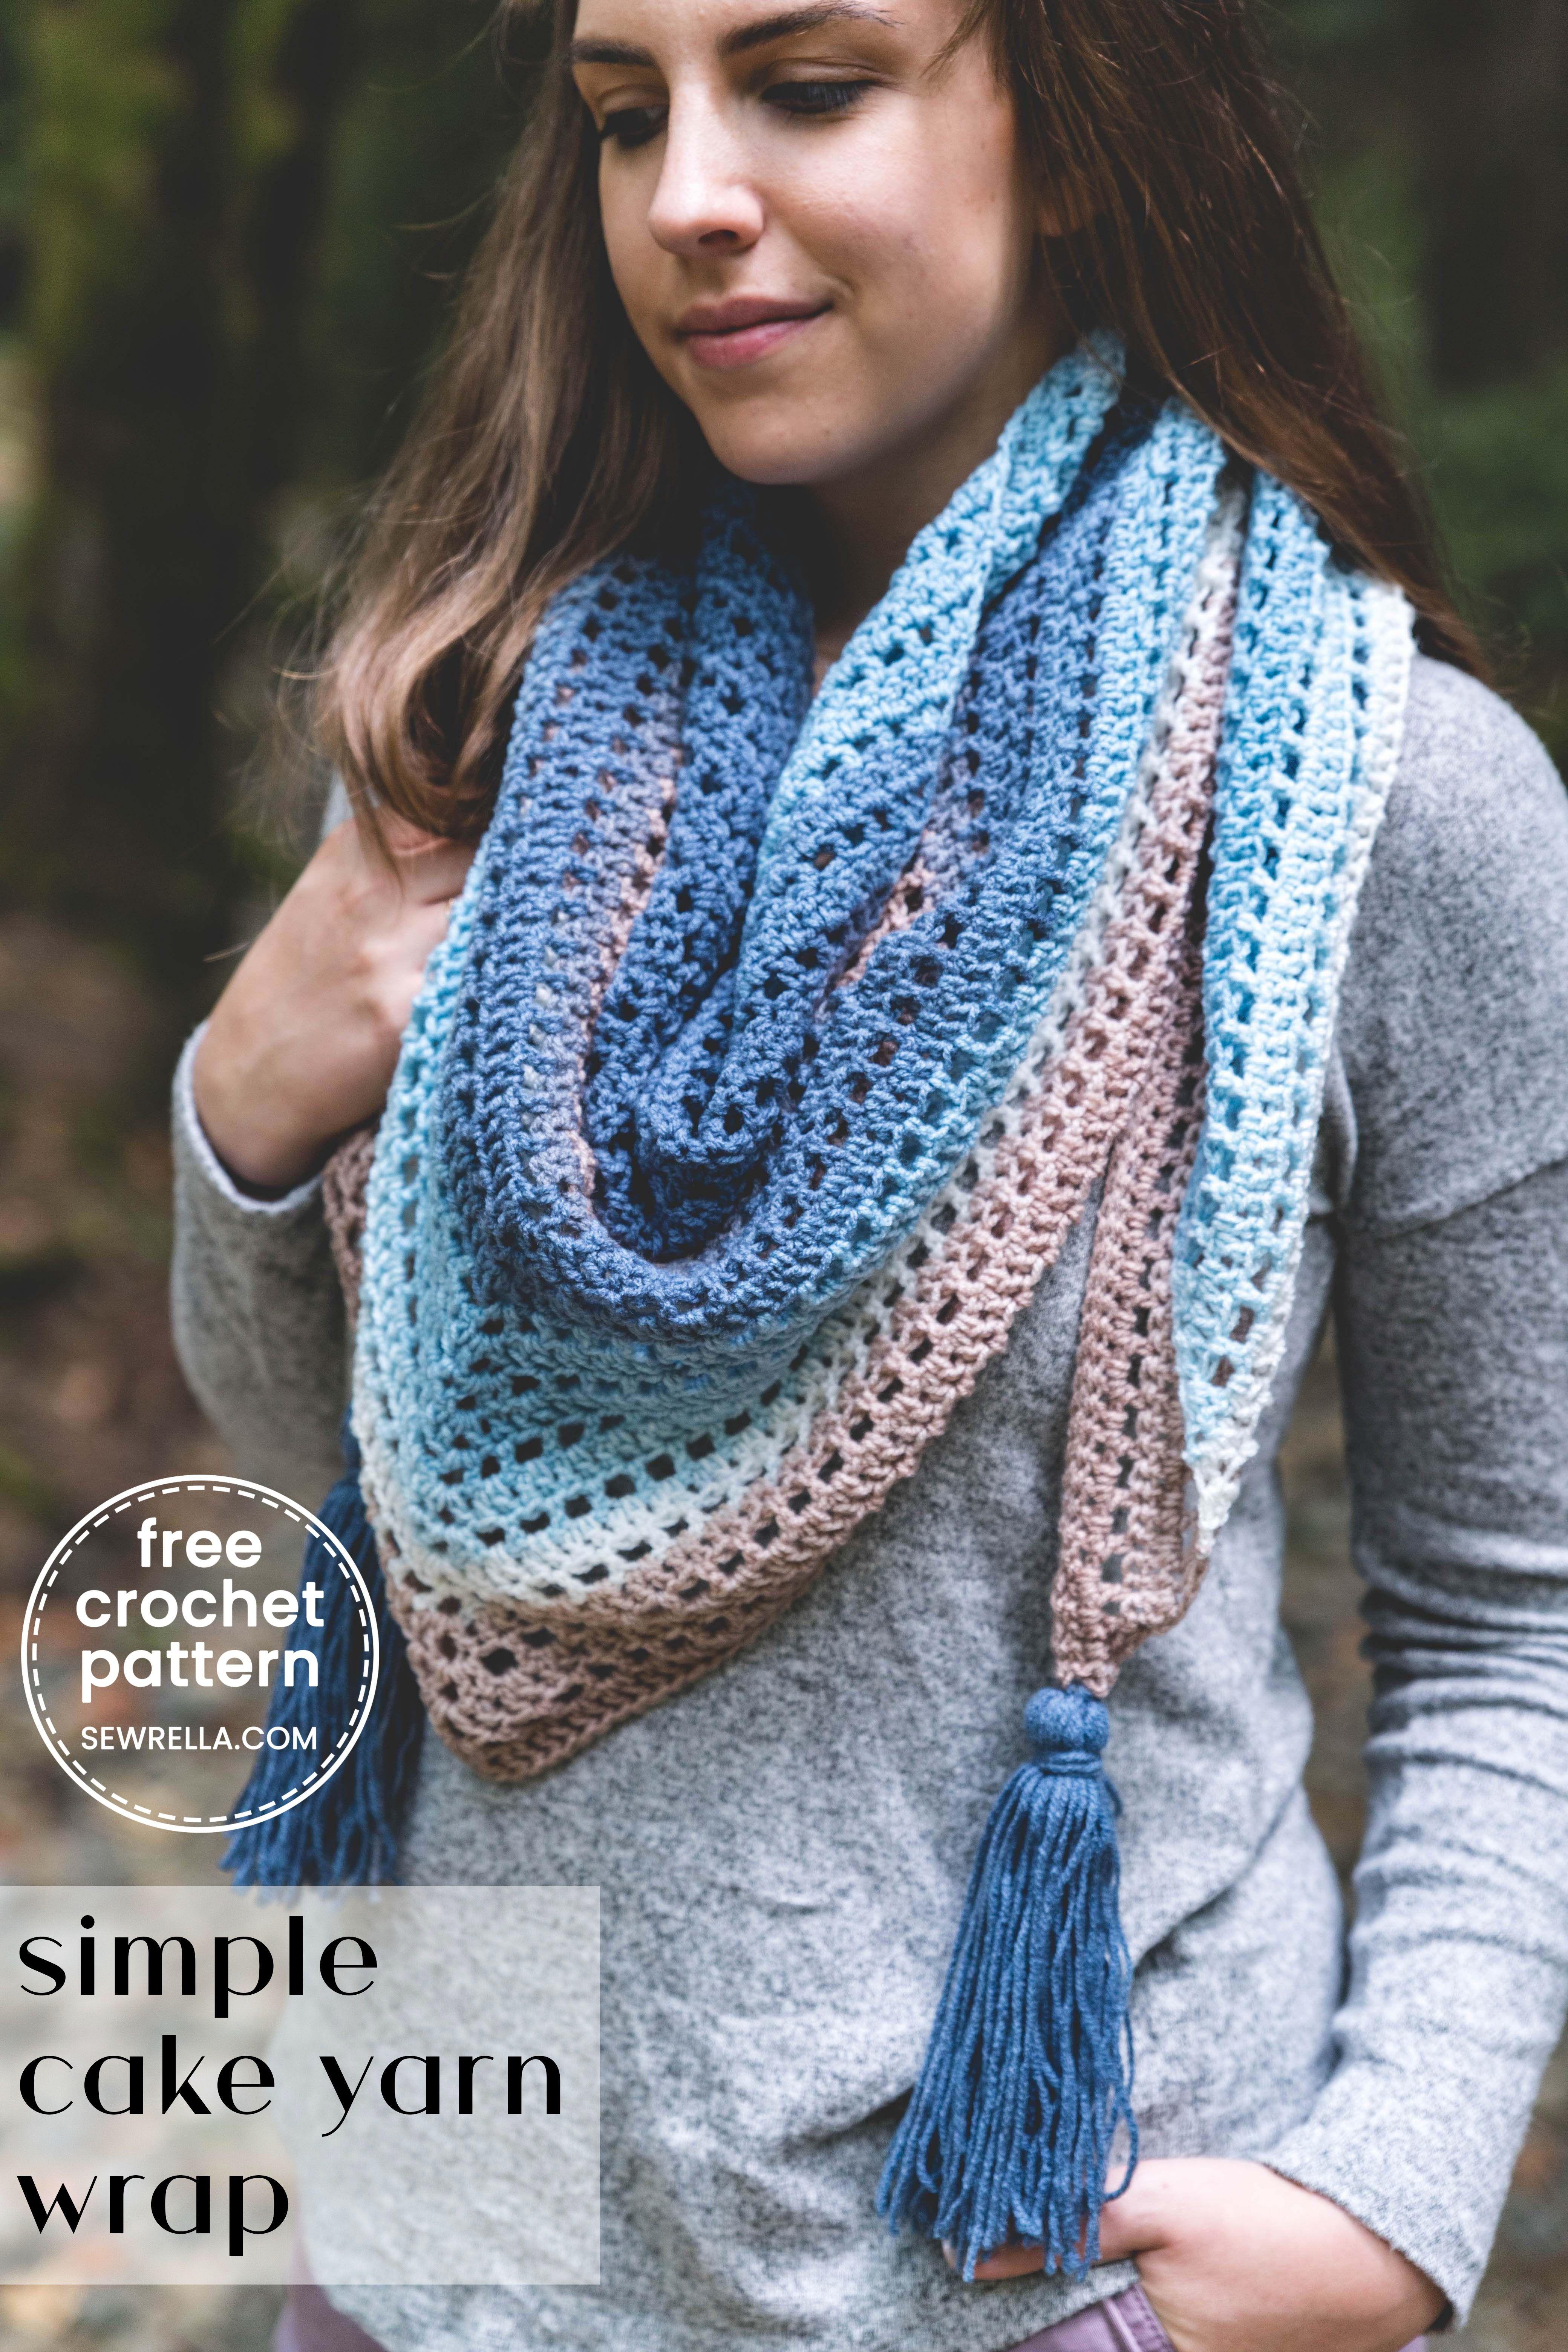 Crochet Beginner Fade Shawl - Free Crochet Pattern &Bull; Sewrella Cakeyarn - Diy Crafts